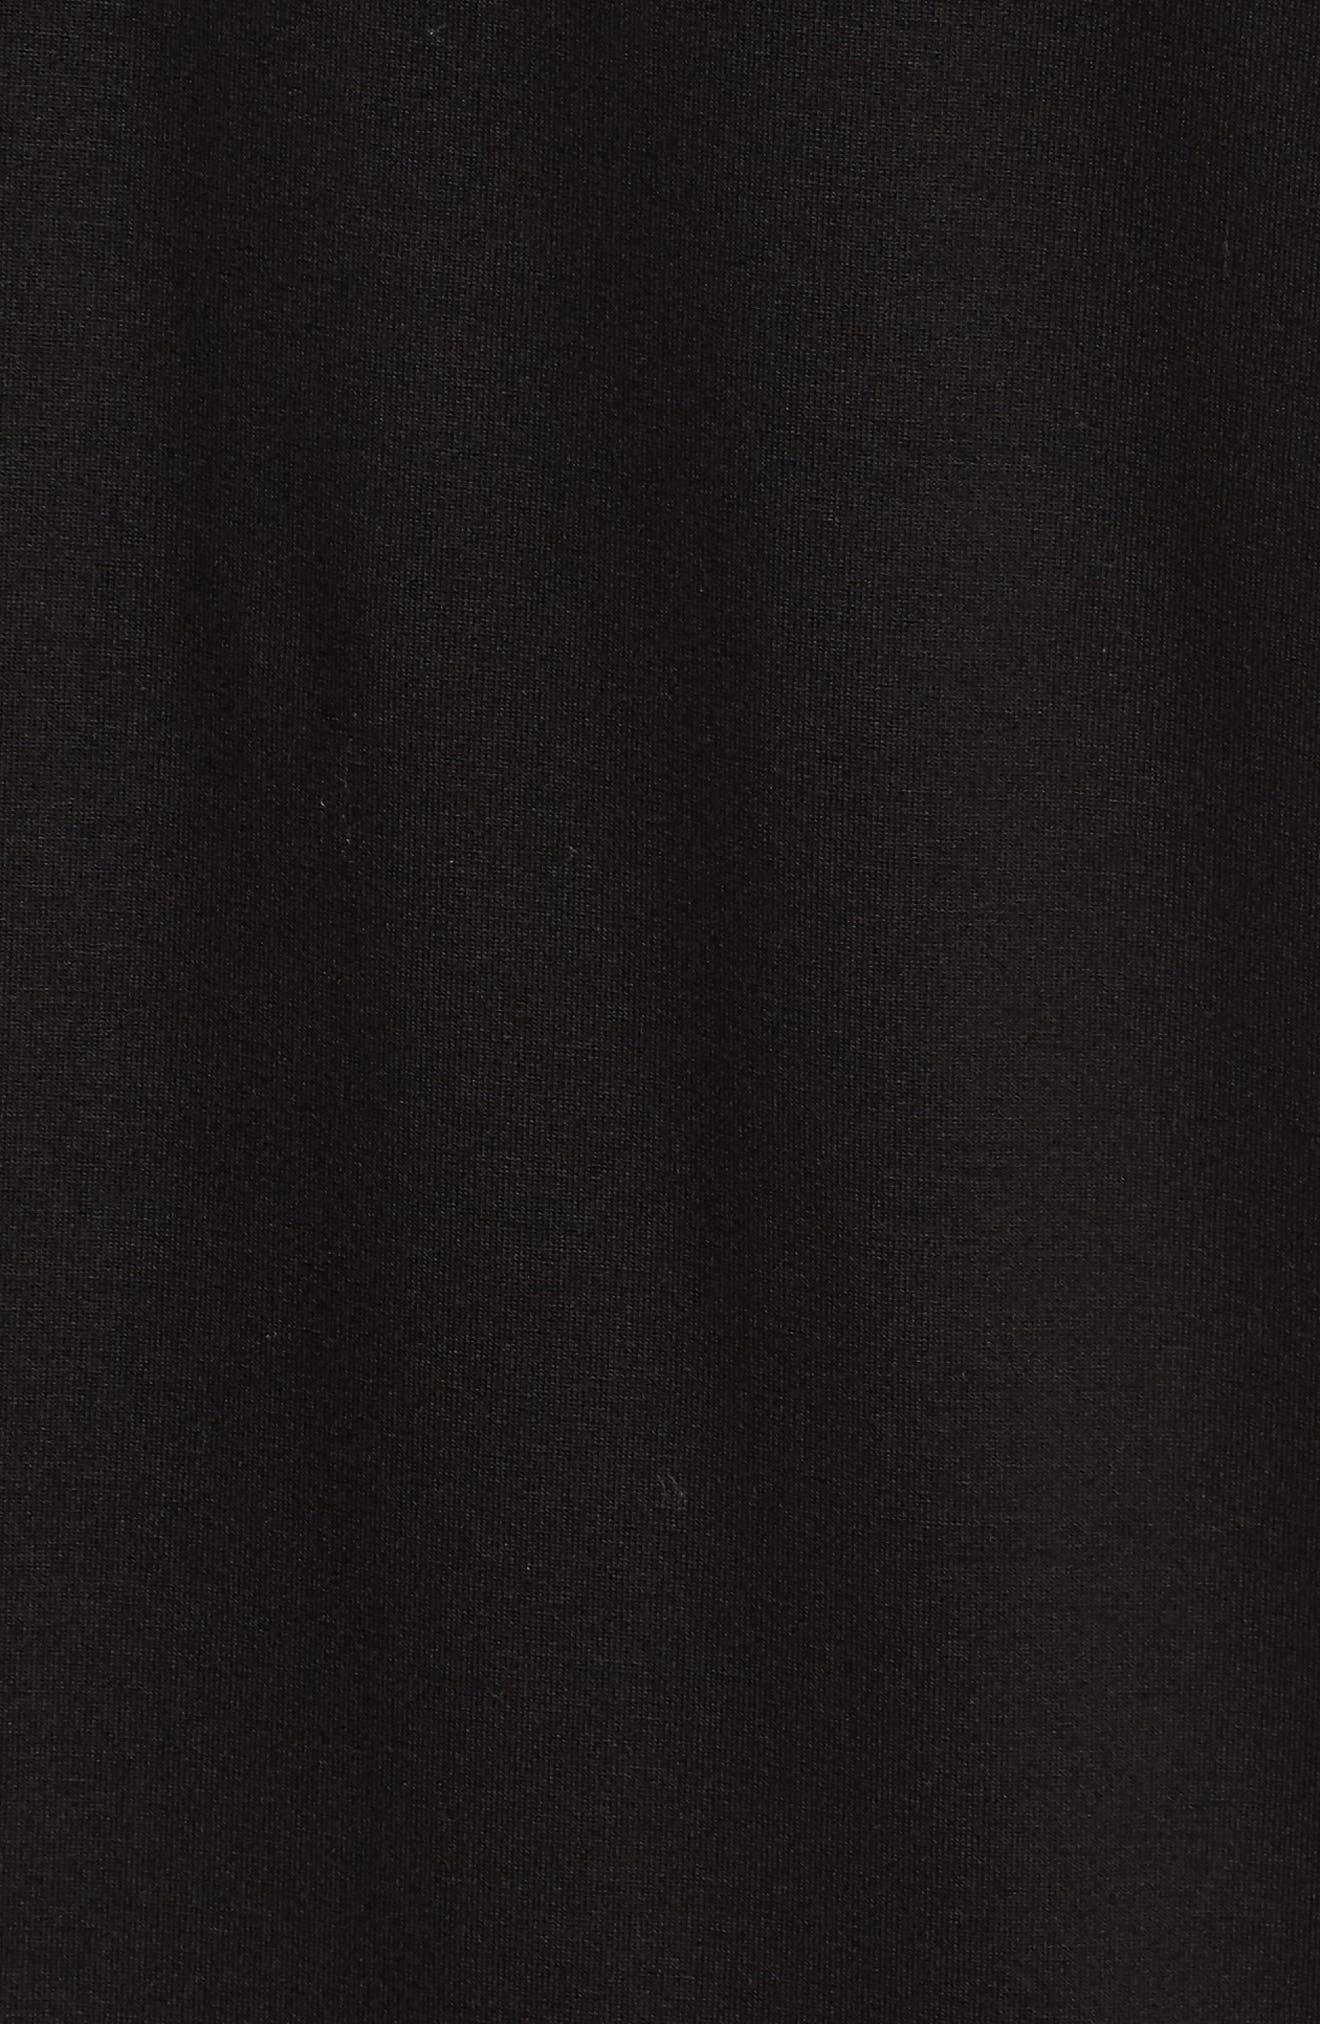 V-Back Stretch Tencel<sup>®</sup> Lyocell Shift Dress,                             Alternate thumbnail 10, color,